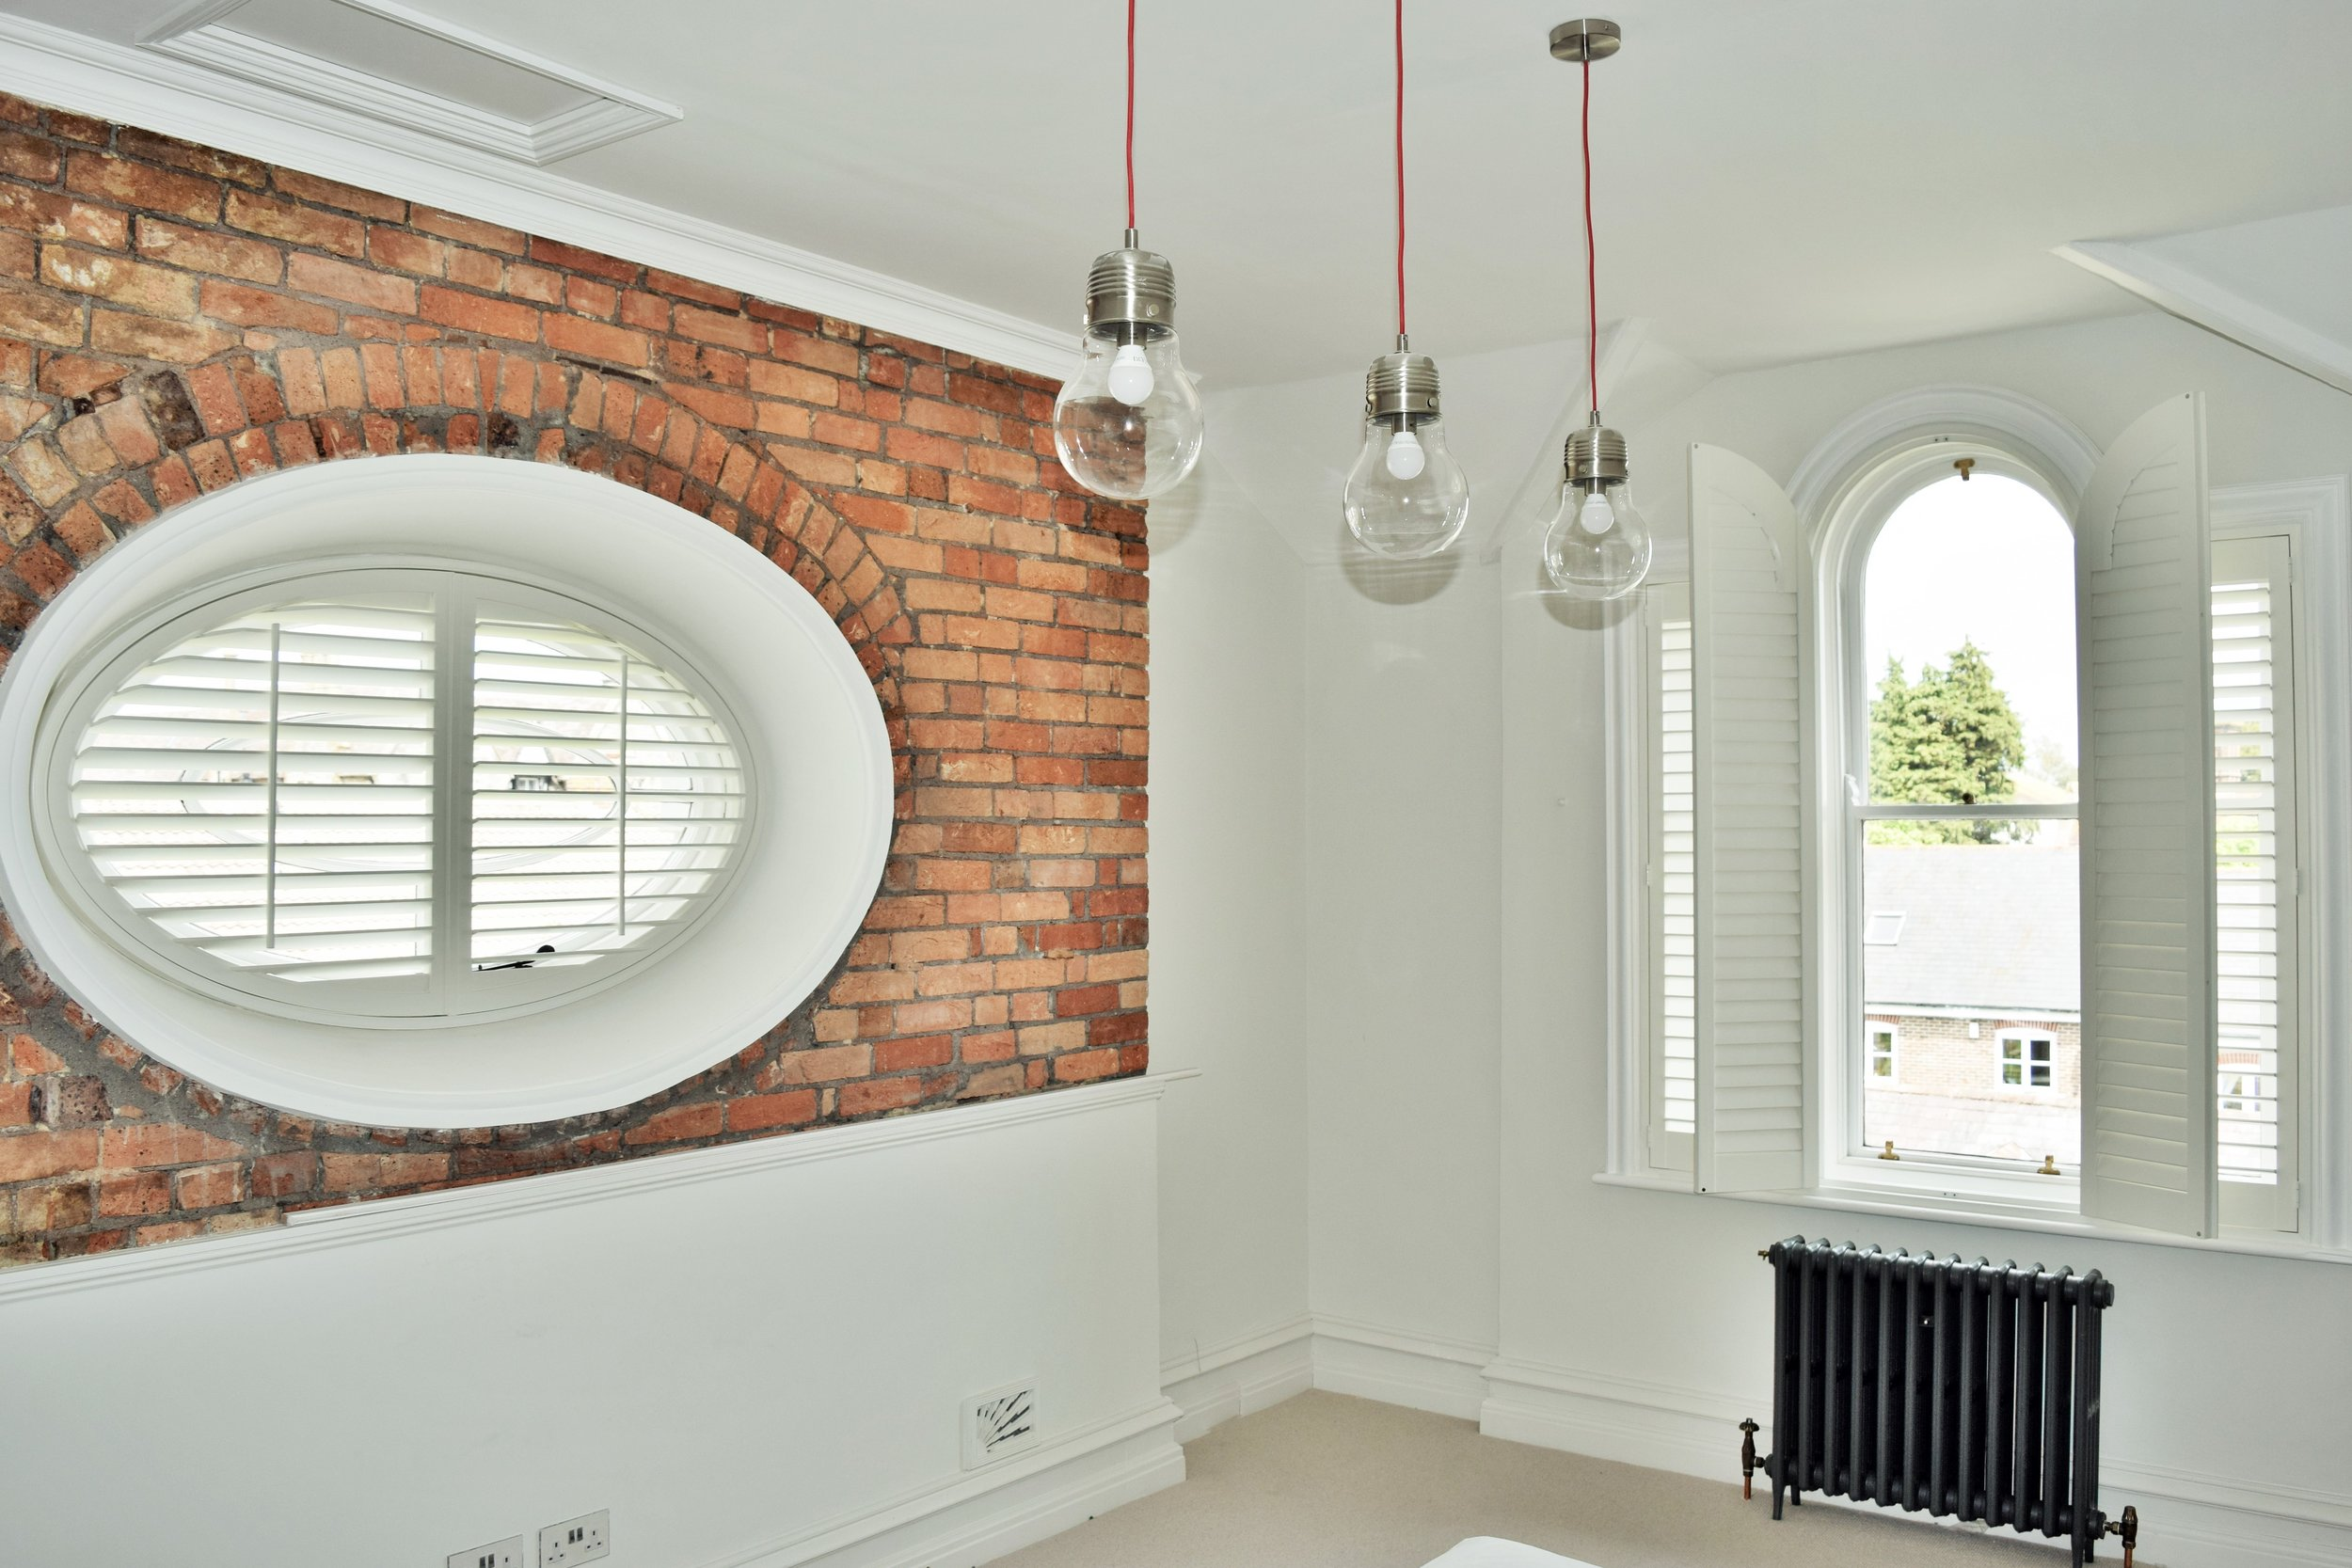 Wooden shutters special shapes windows.JPG